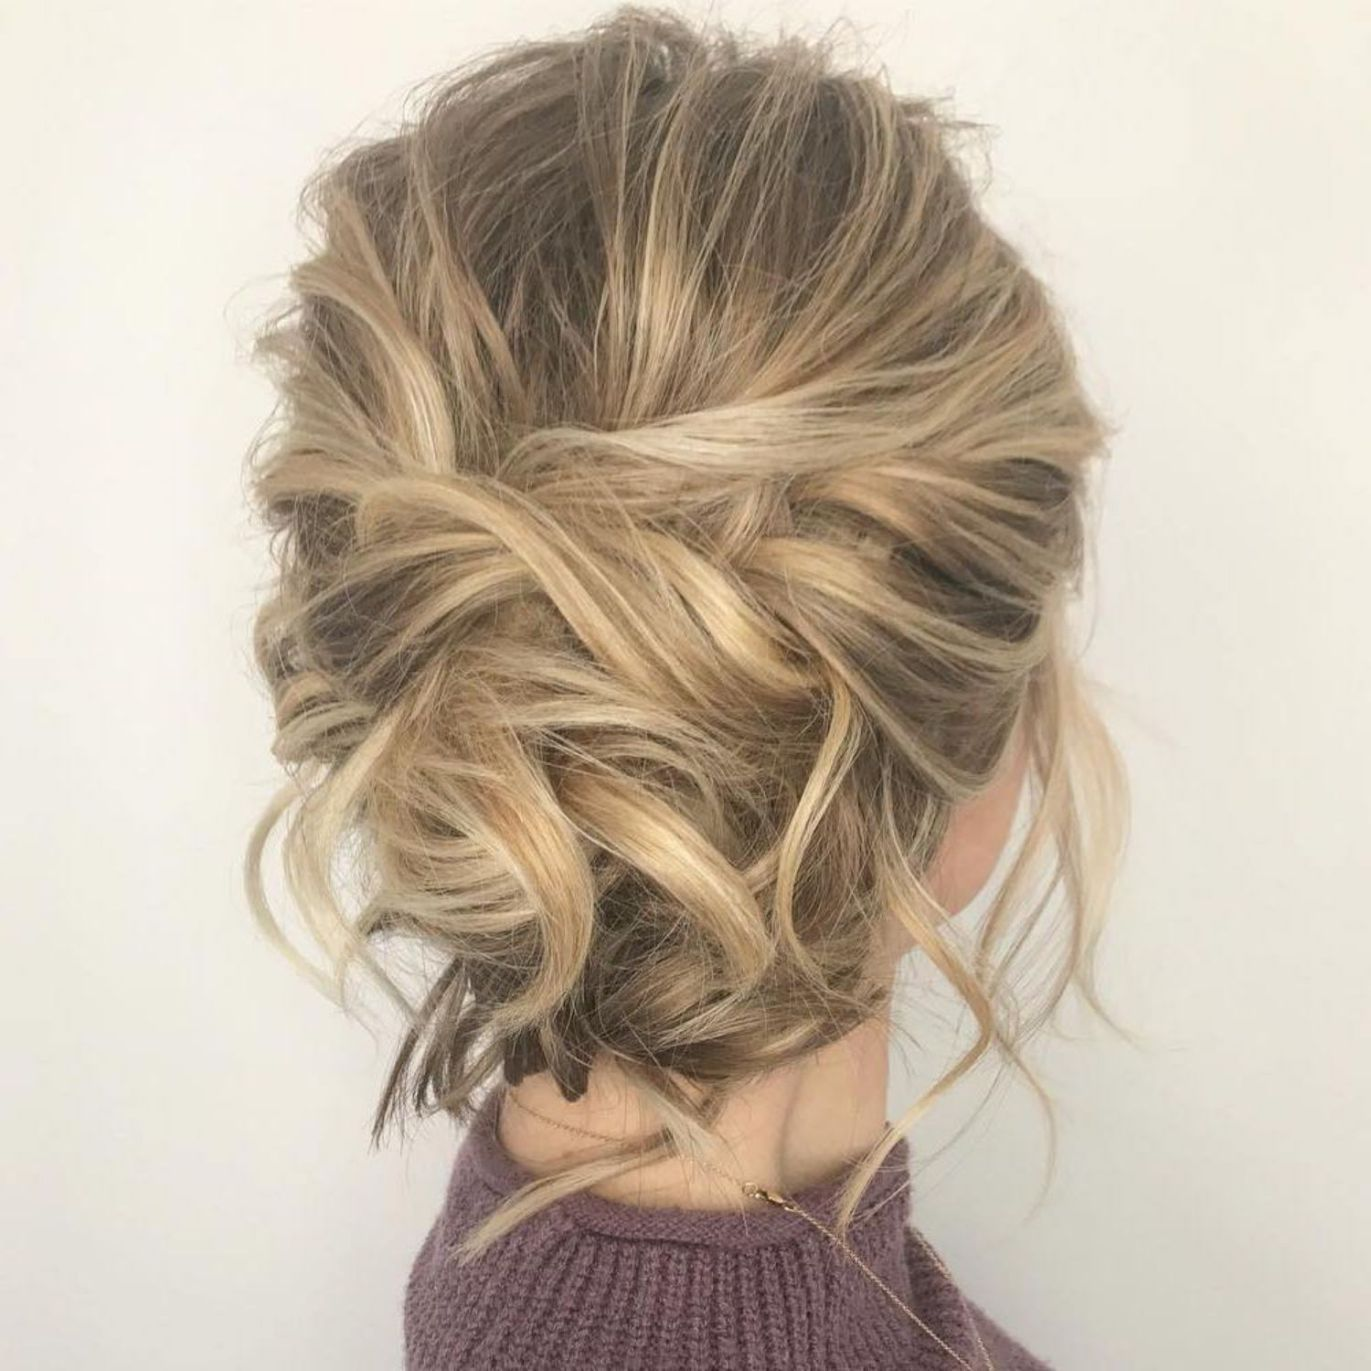 60 Trendiest Updos For Medium Length Hair Updos For Medium Length Hair Medium Fine Hair Easy Updo Hairstyles